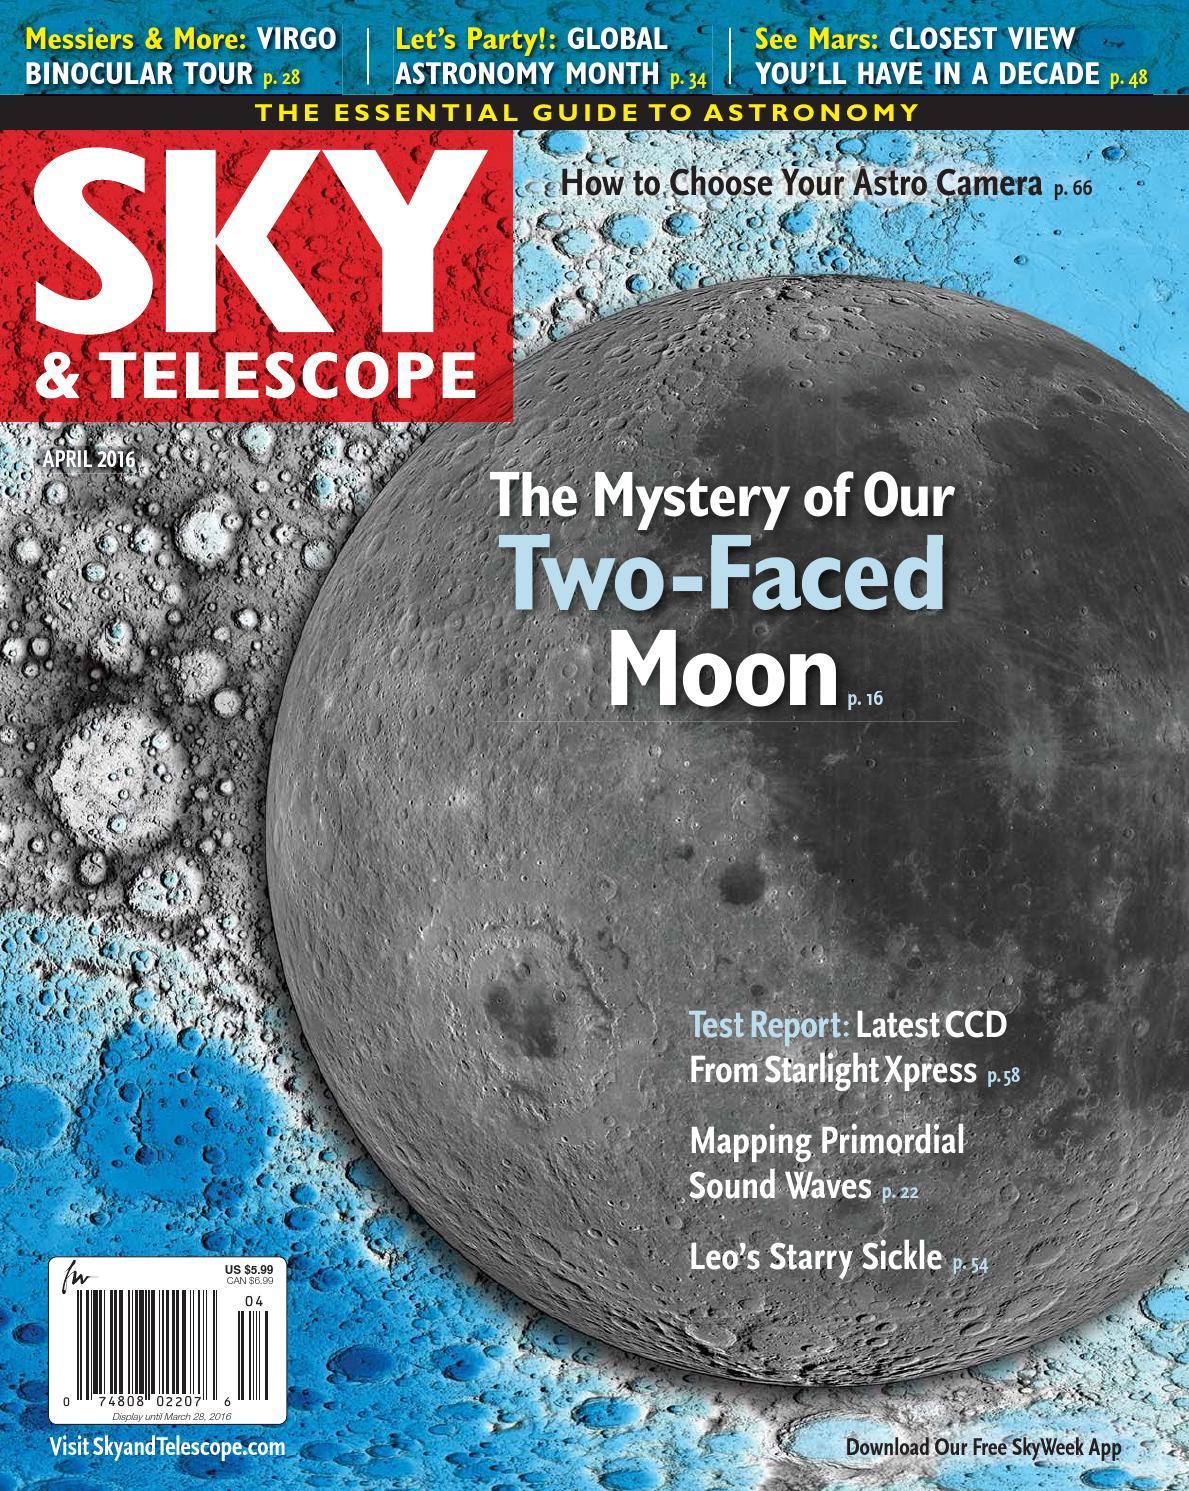 Sky And Telescope 2016 4 By Adolfojorge Issuu Hyperstart Dual Battery Isolator Wiring